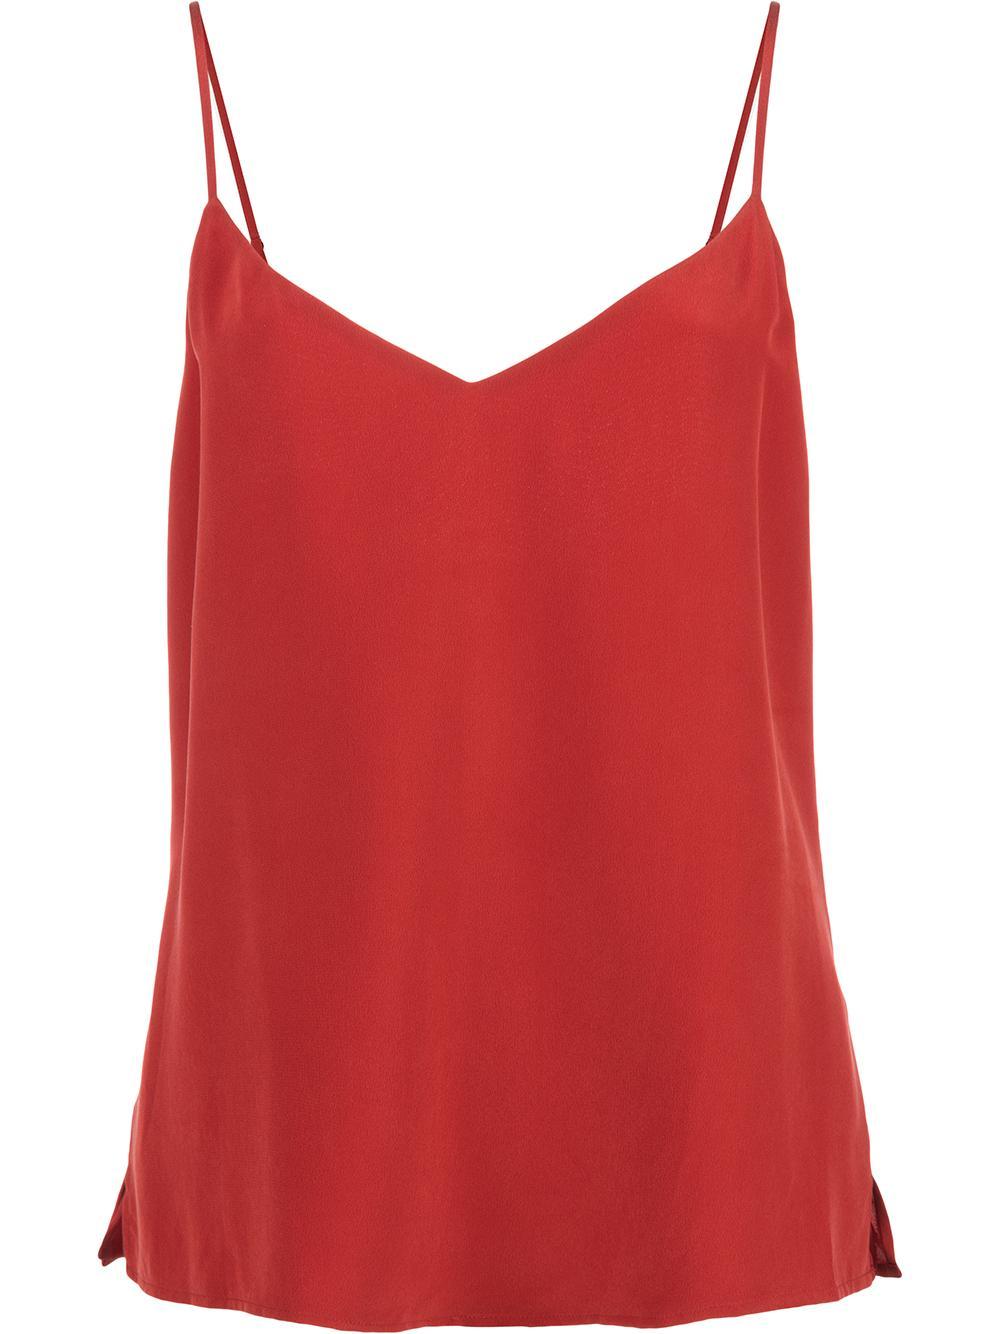 Jane Spagstrap Silk Camisole Item # 4713CDC-F19